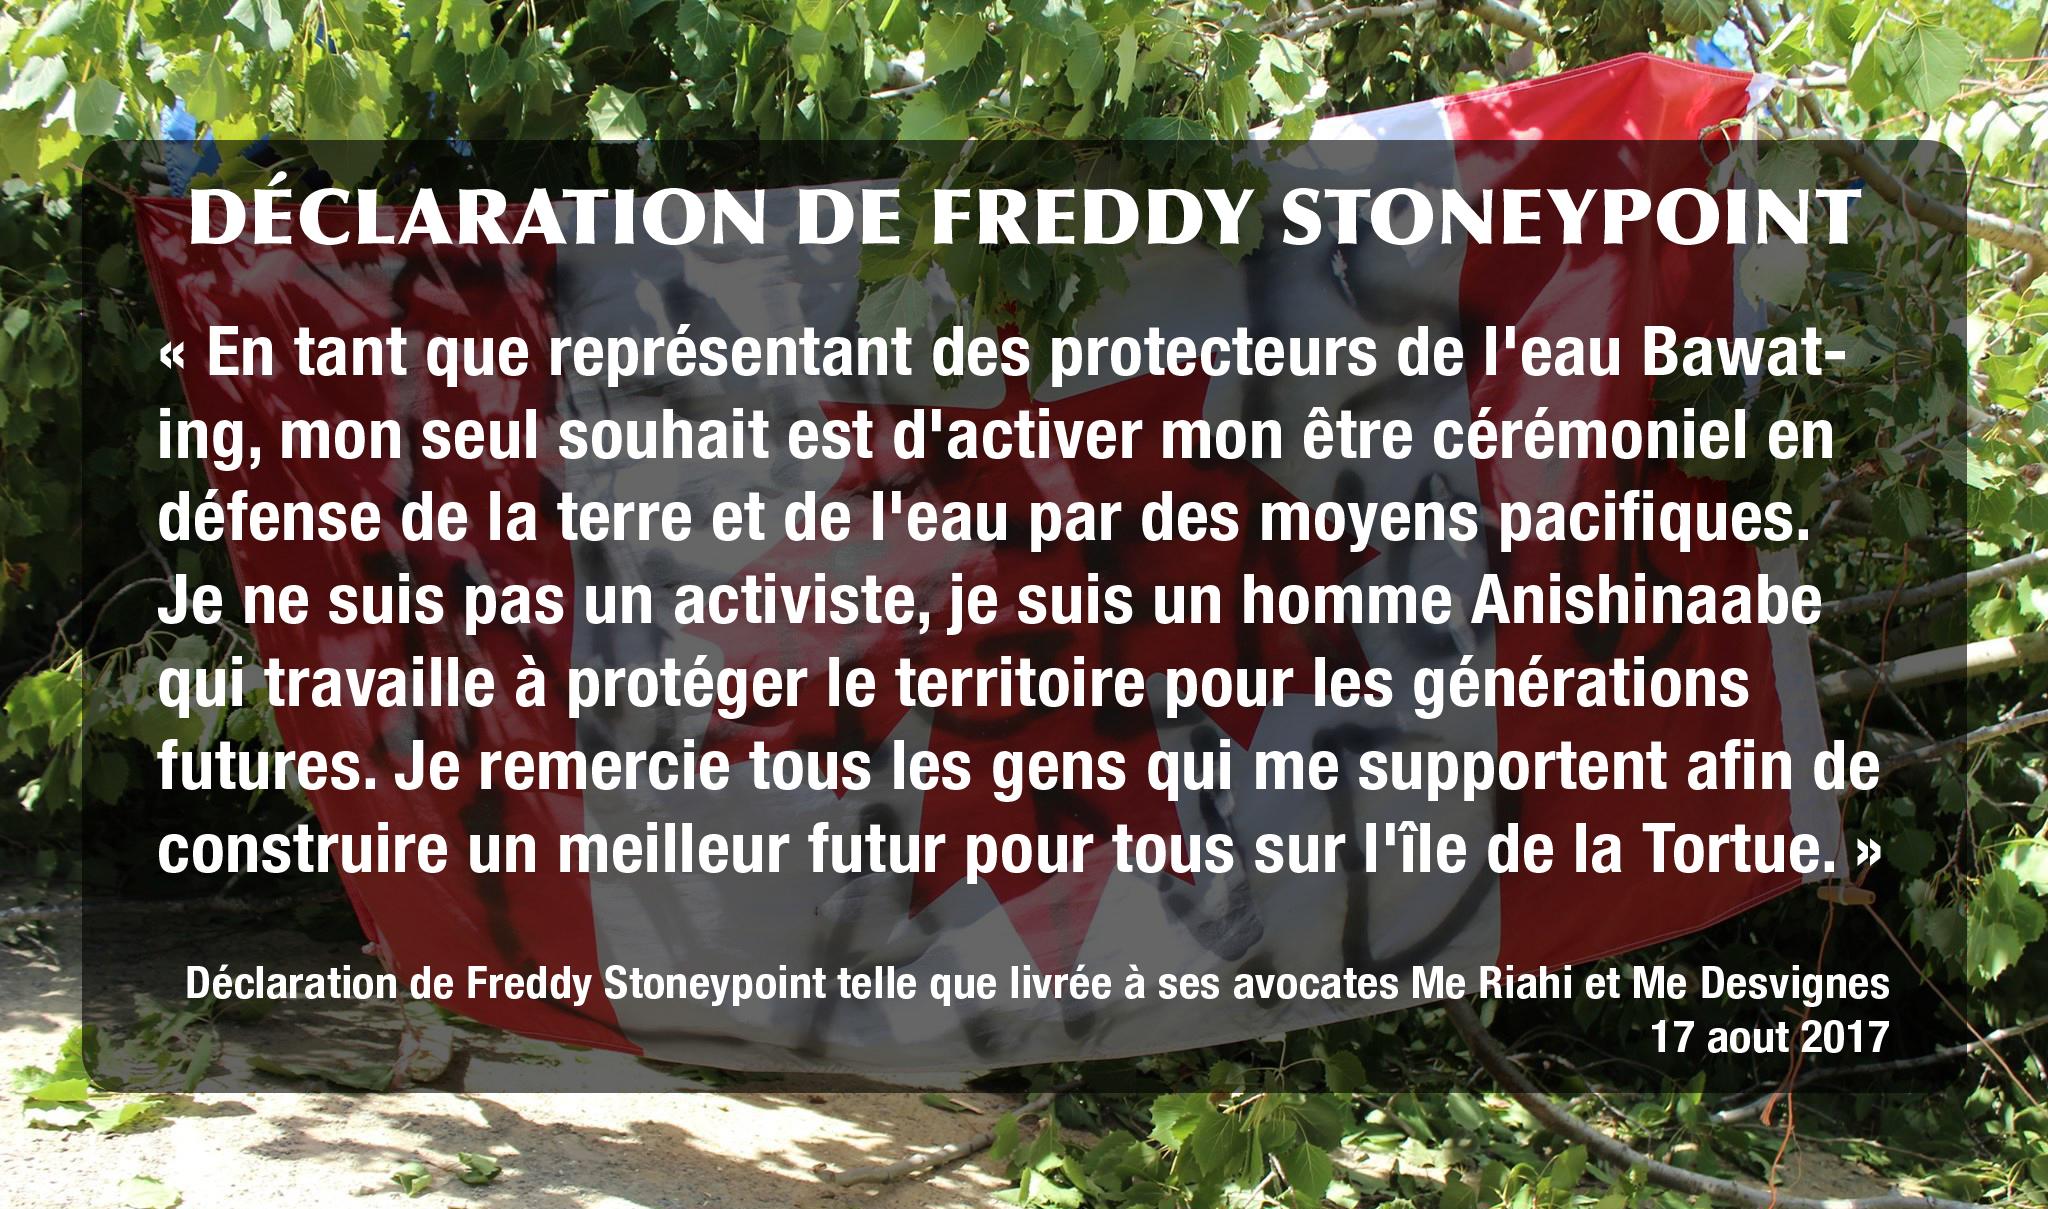 Déclaration de Freddy Stoneypoint